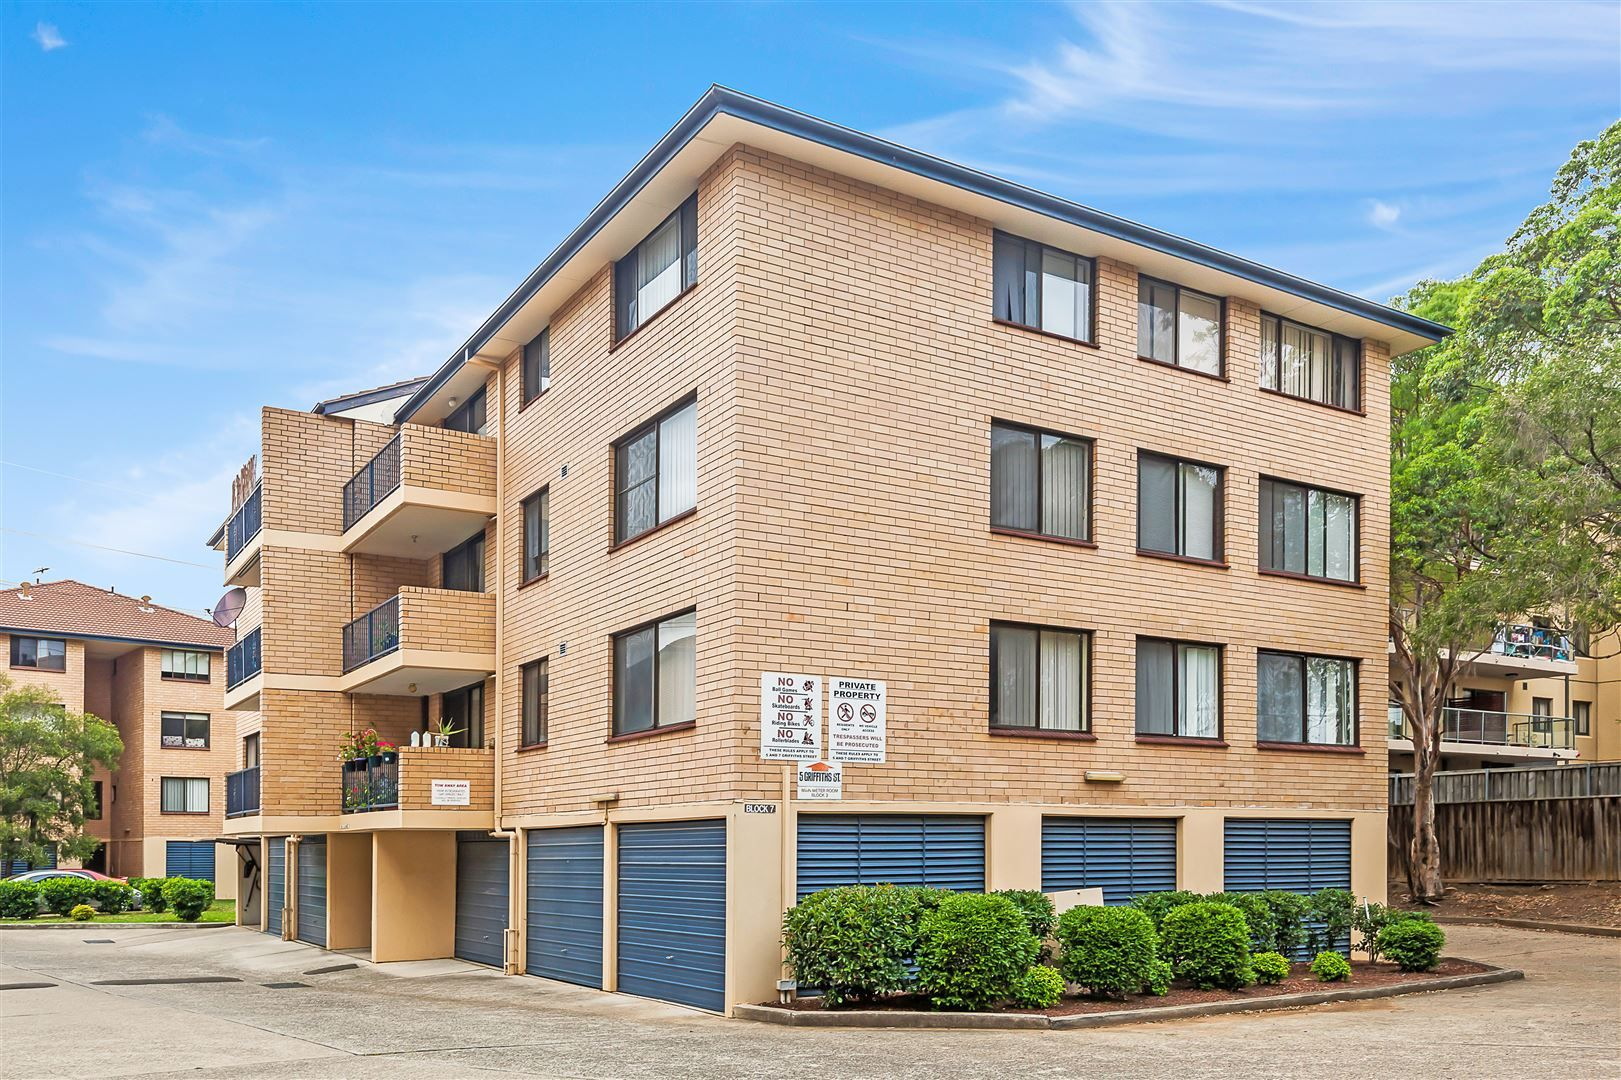 74/5 Griffiths Street, Blacktown NSW 2148, Image 0